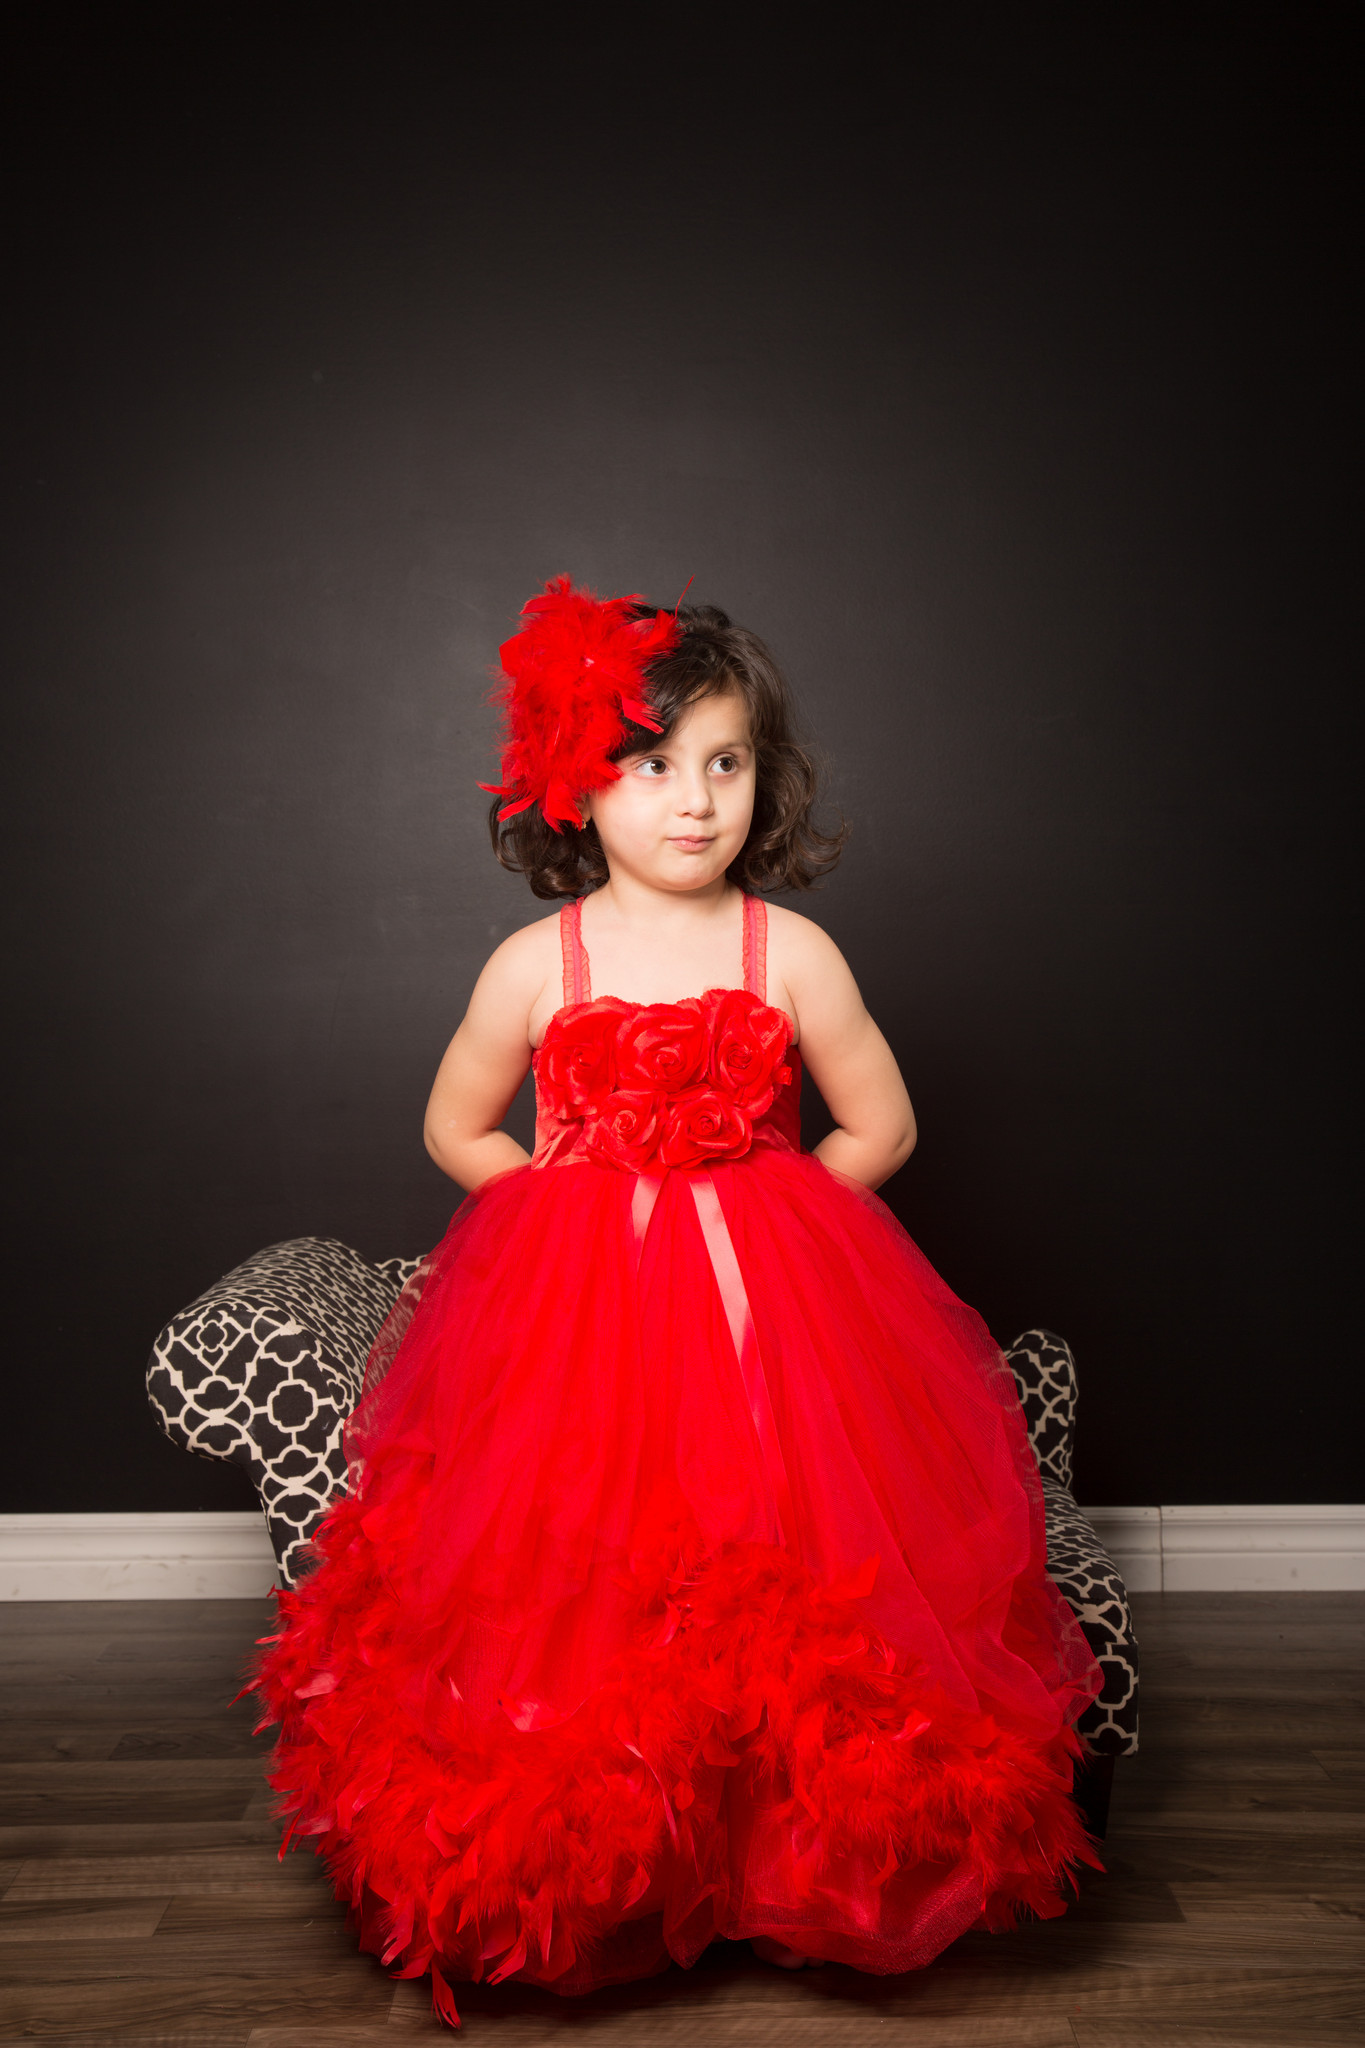 Tutu Dress Picture Collection | DressedUpGirl.com